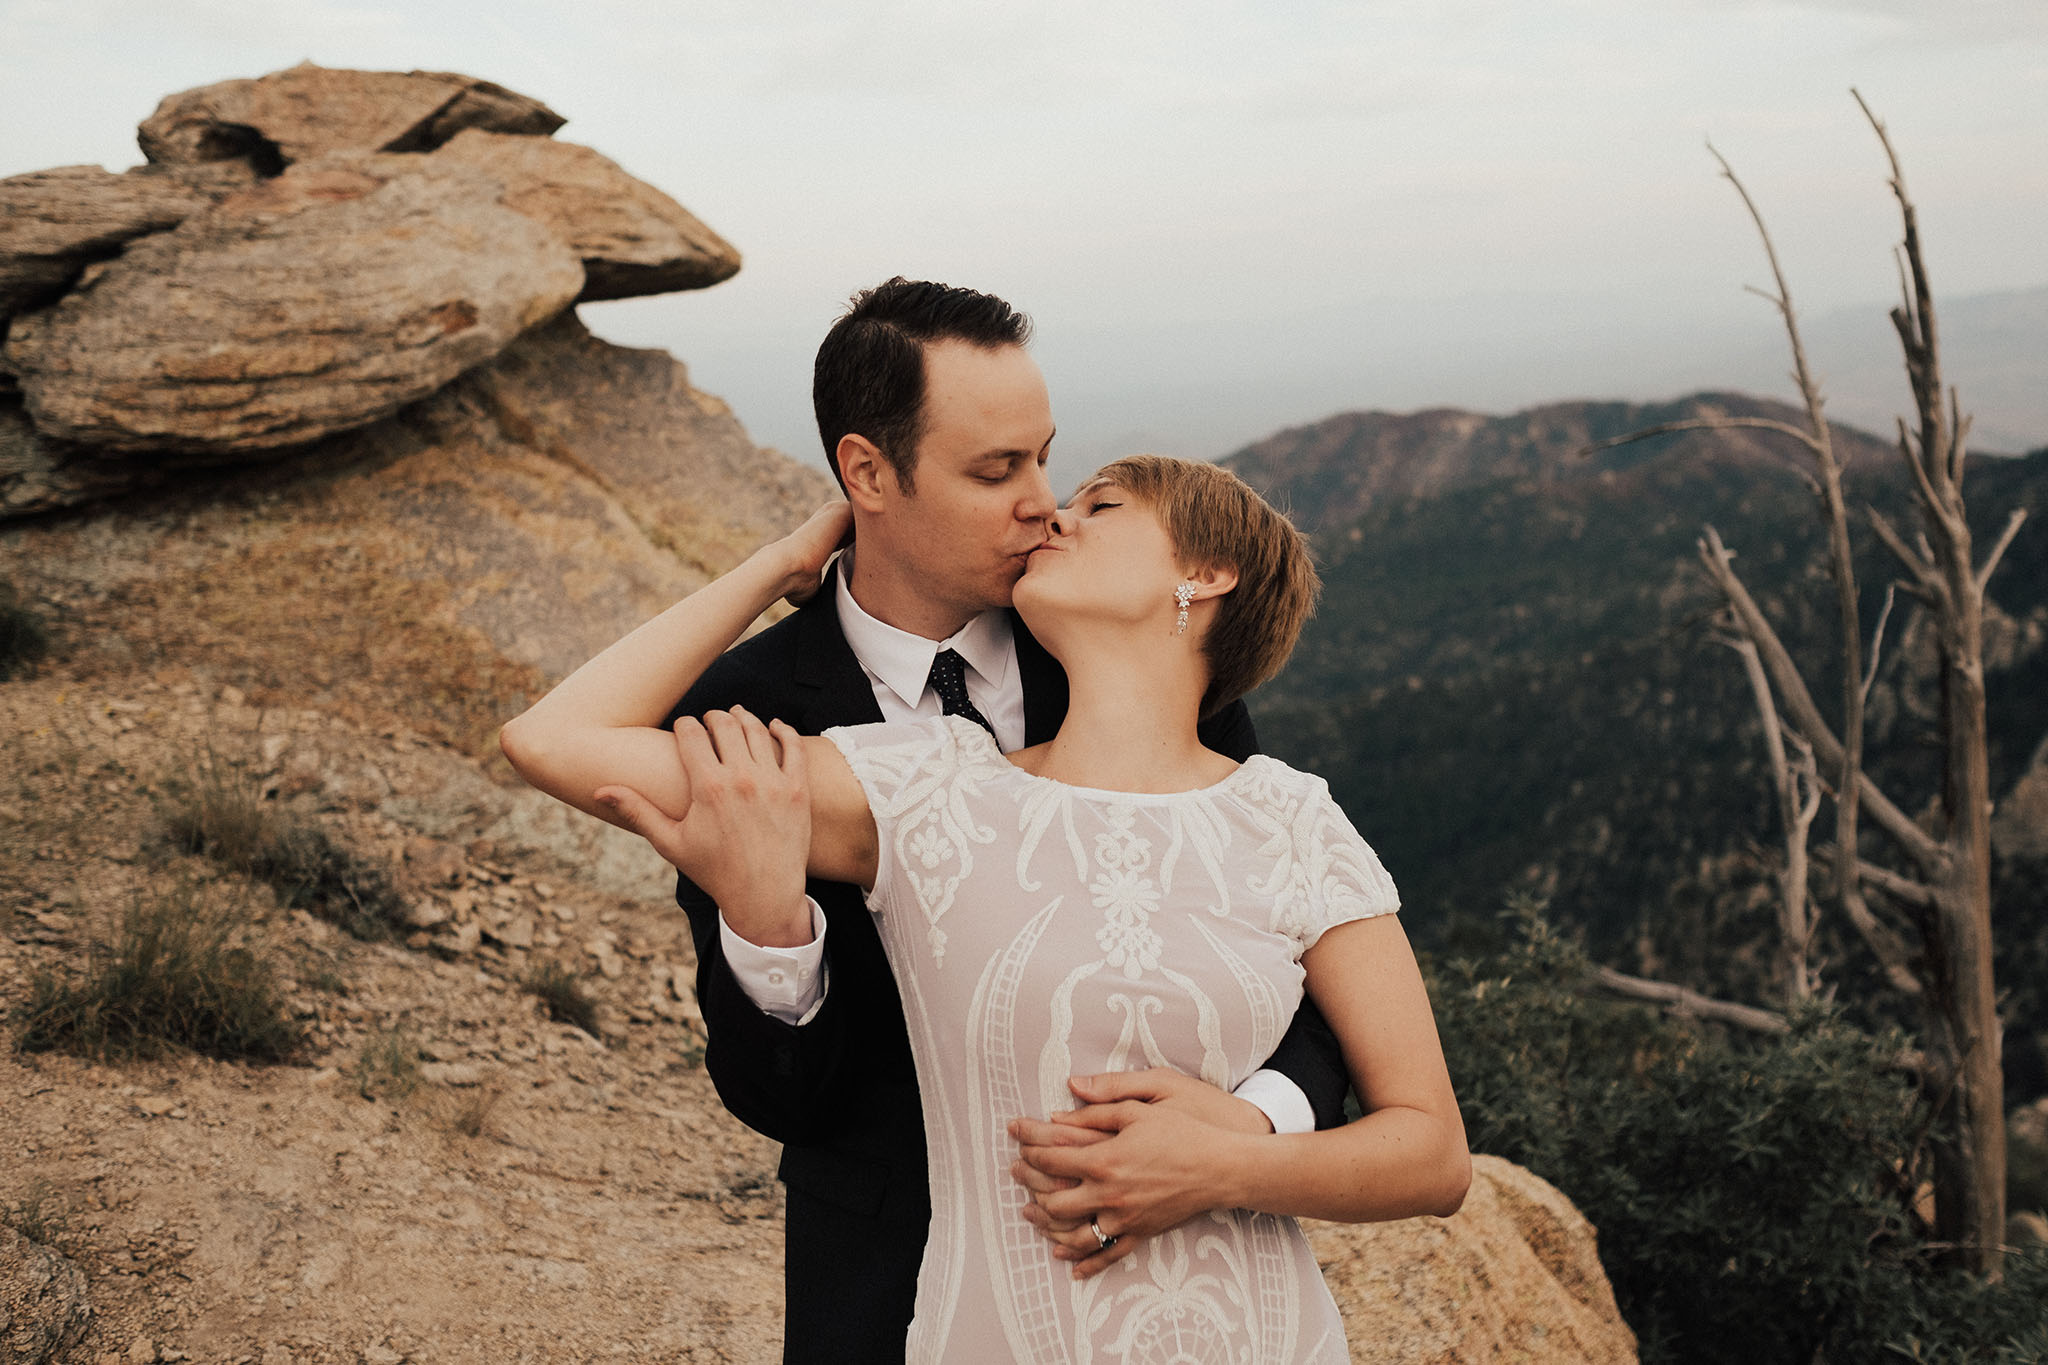 Arizona-Intimate-Elopement-Adventure-Photographer-Mount-Lemmon (19).jpg